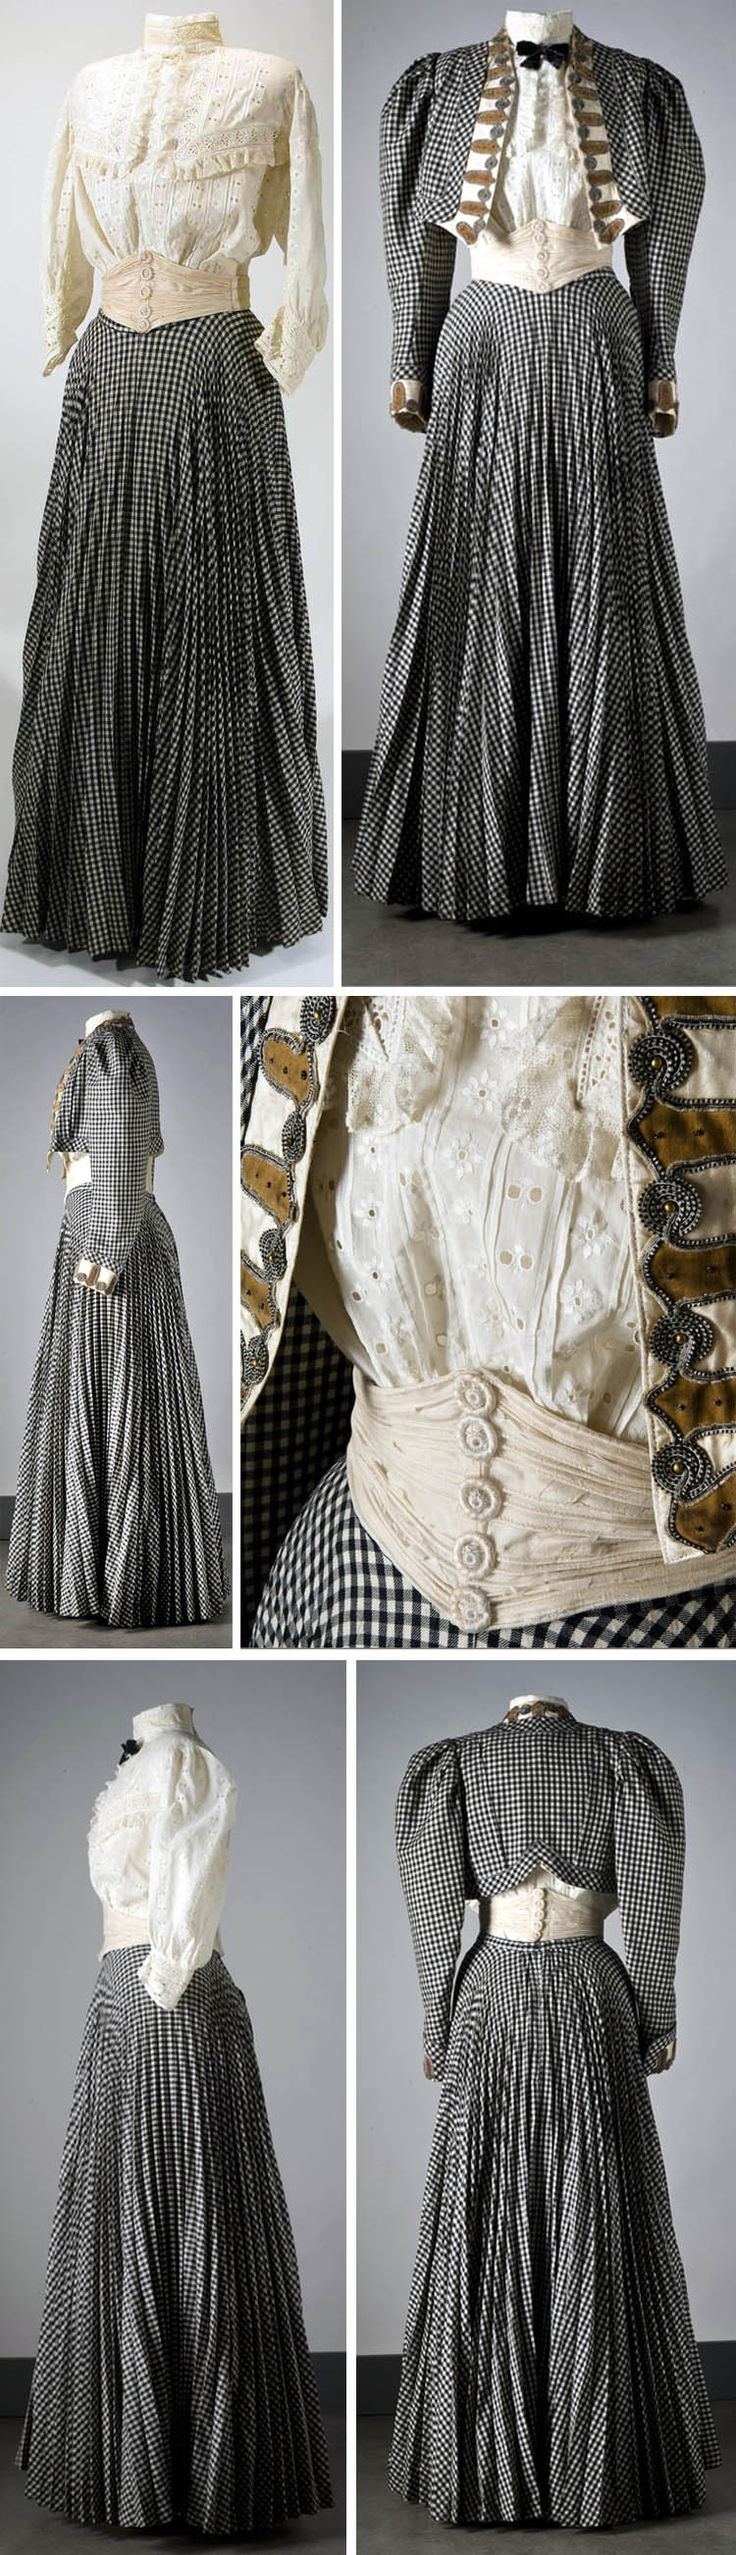 1906 Walking ensemble: Jacket, skirt, blouse, and cummerbund. Wool and cotton. Photos: Mats Landin. Via Nordic Museum, Sweden.